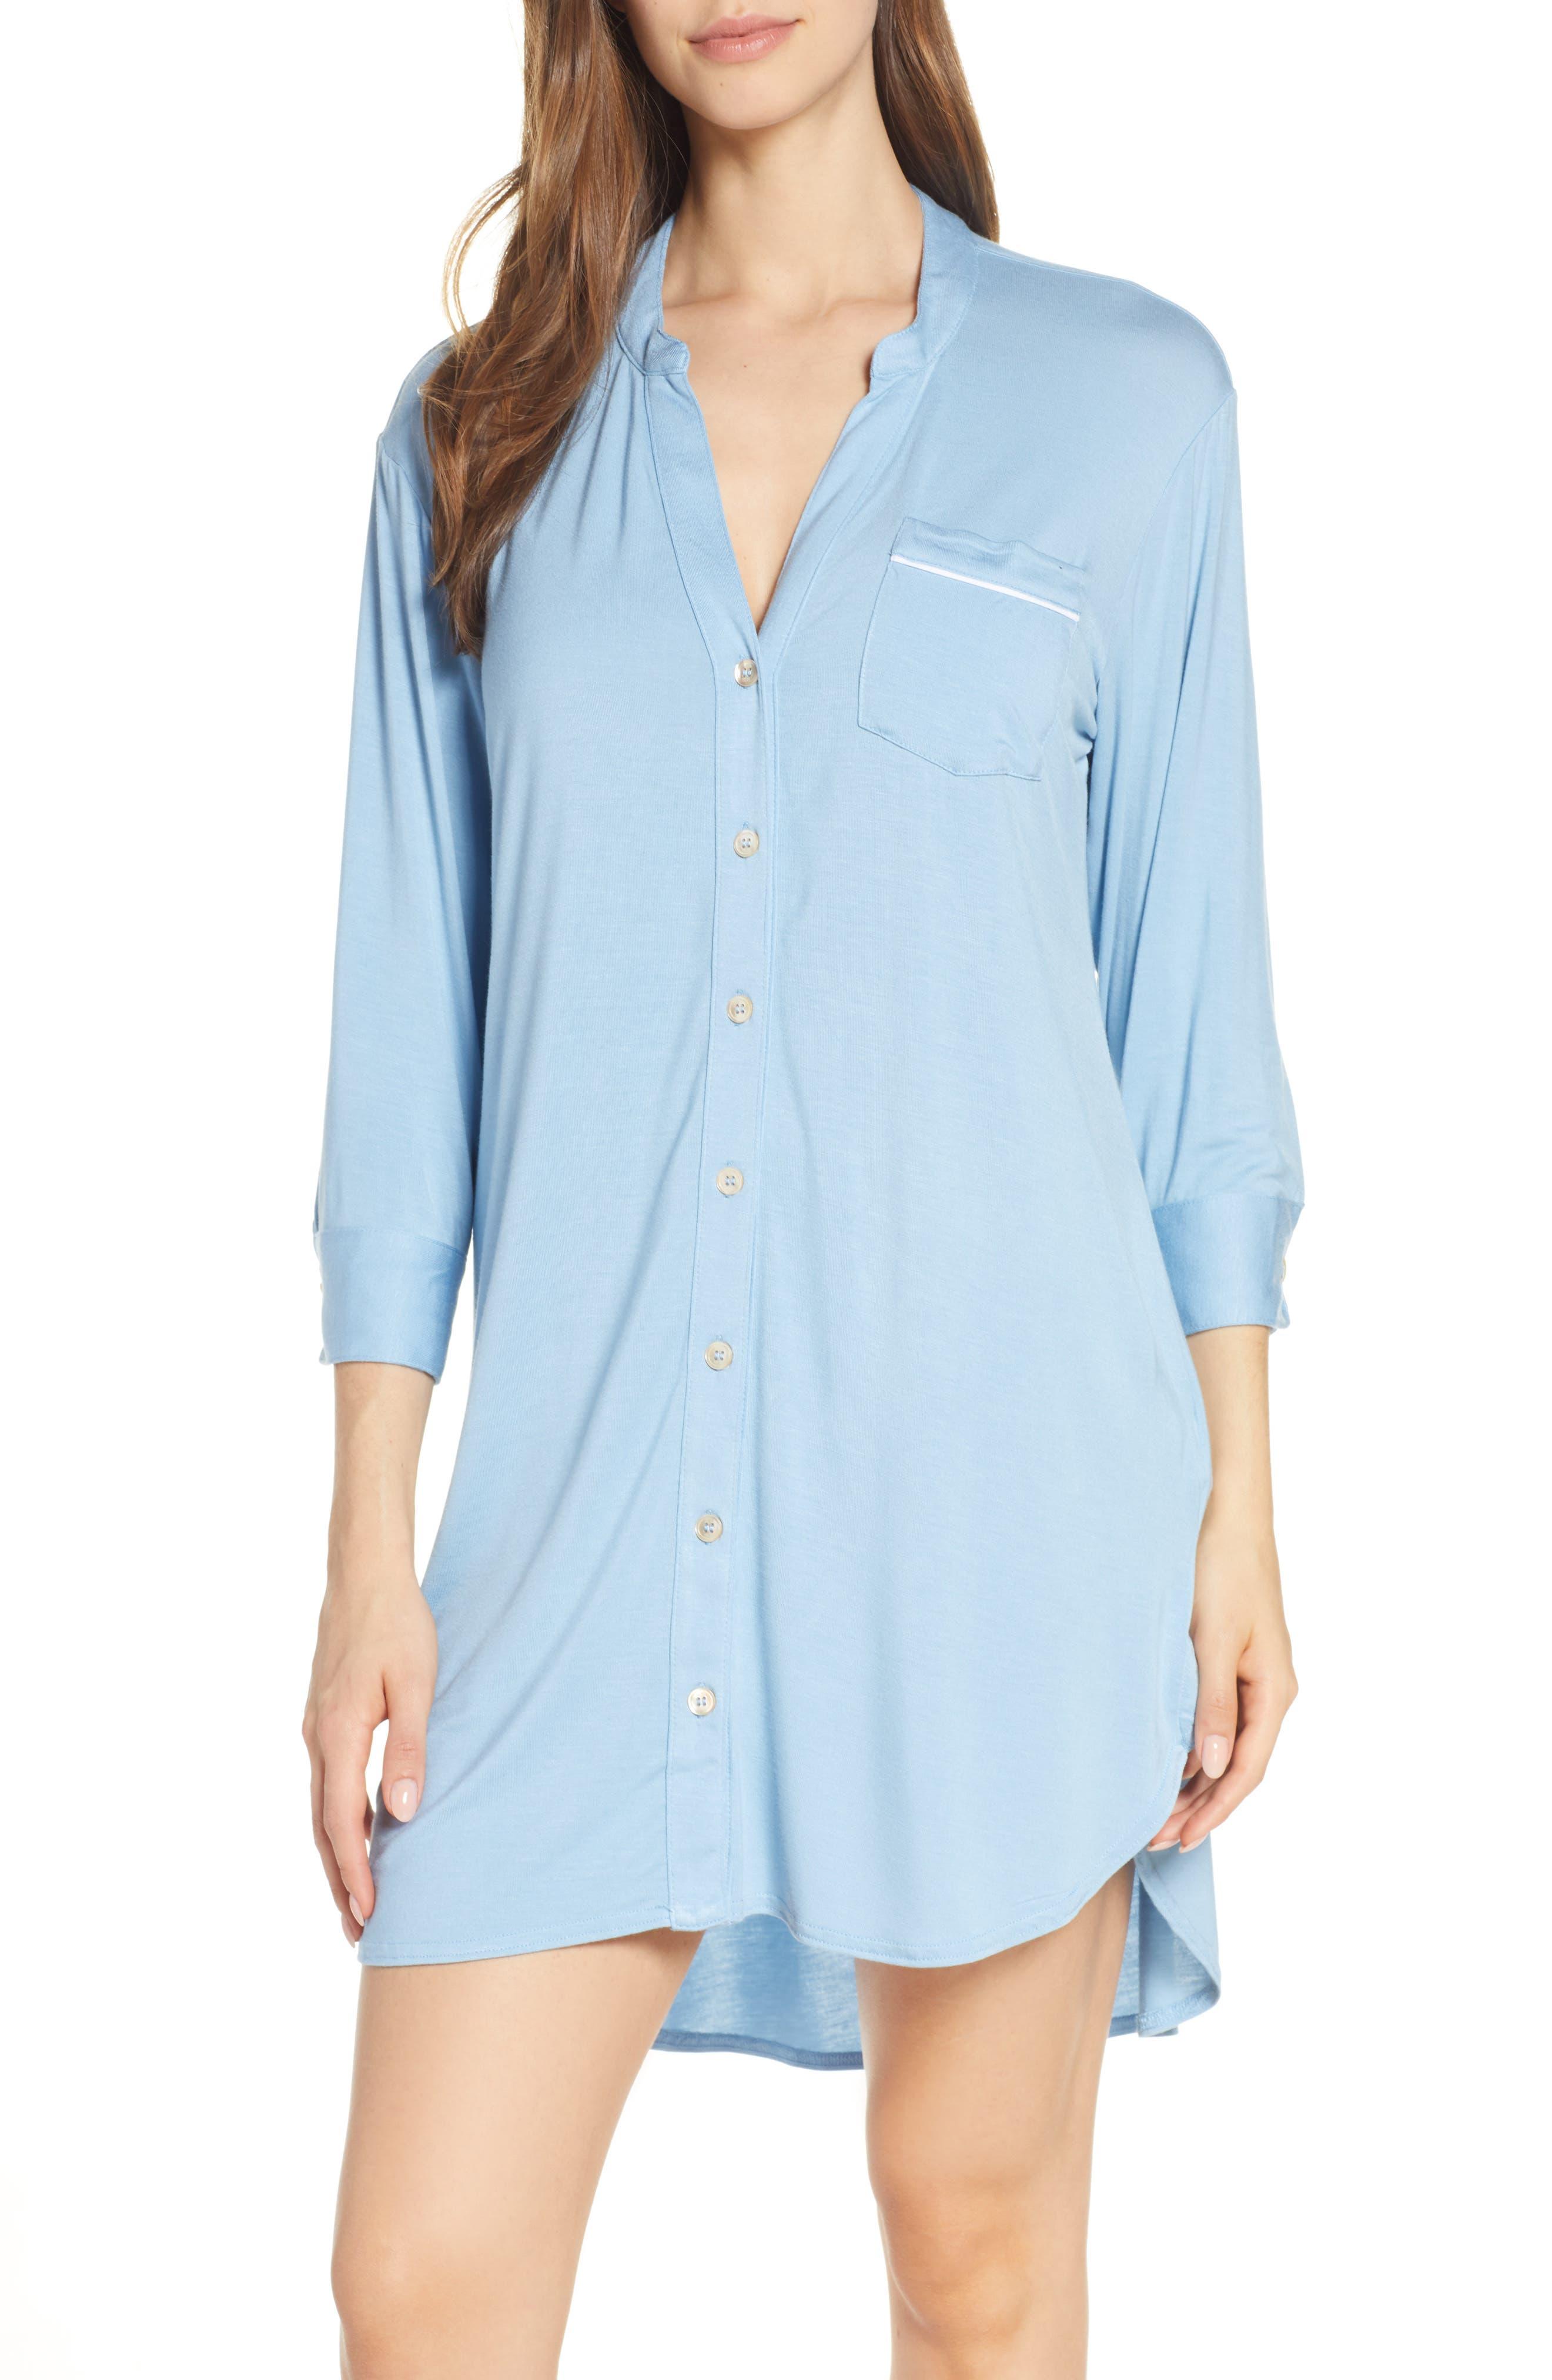 Ugg Vivian Sleep Shirt, Blue